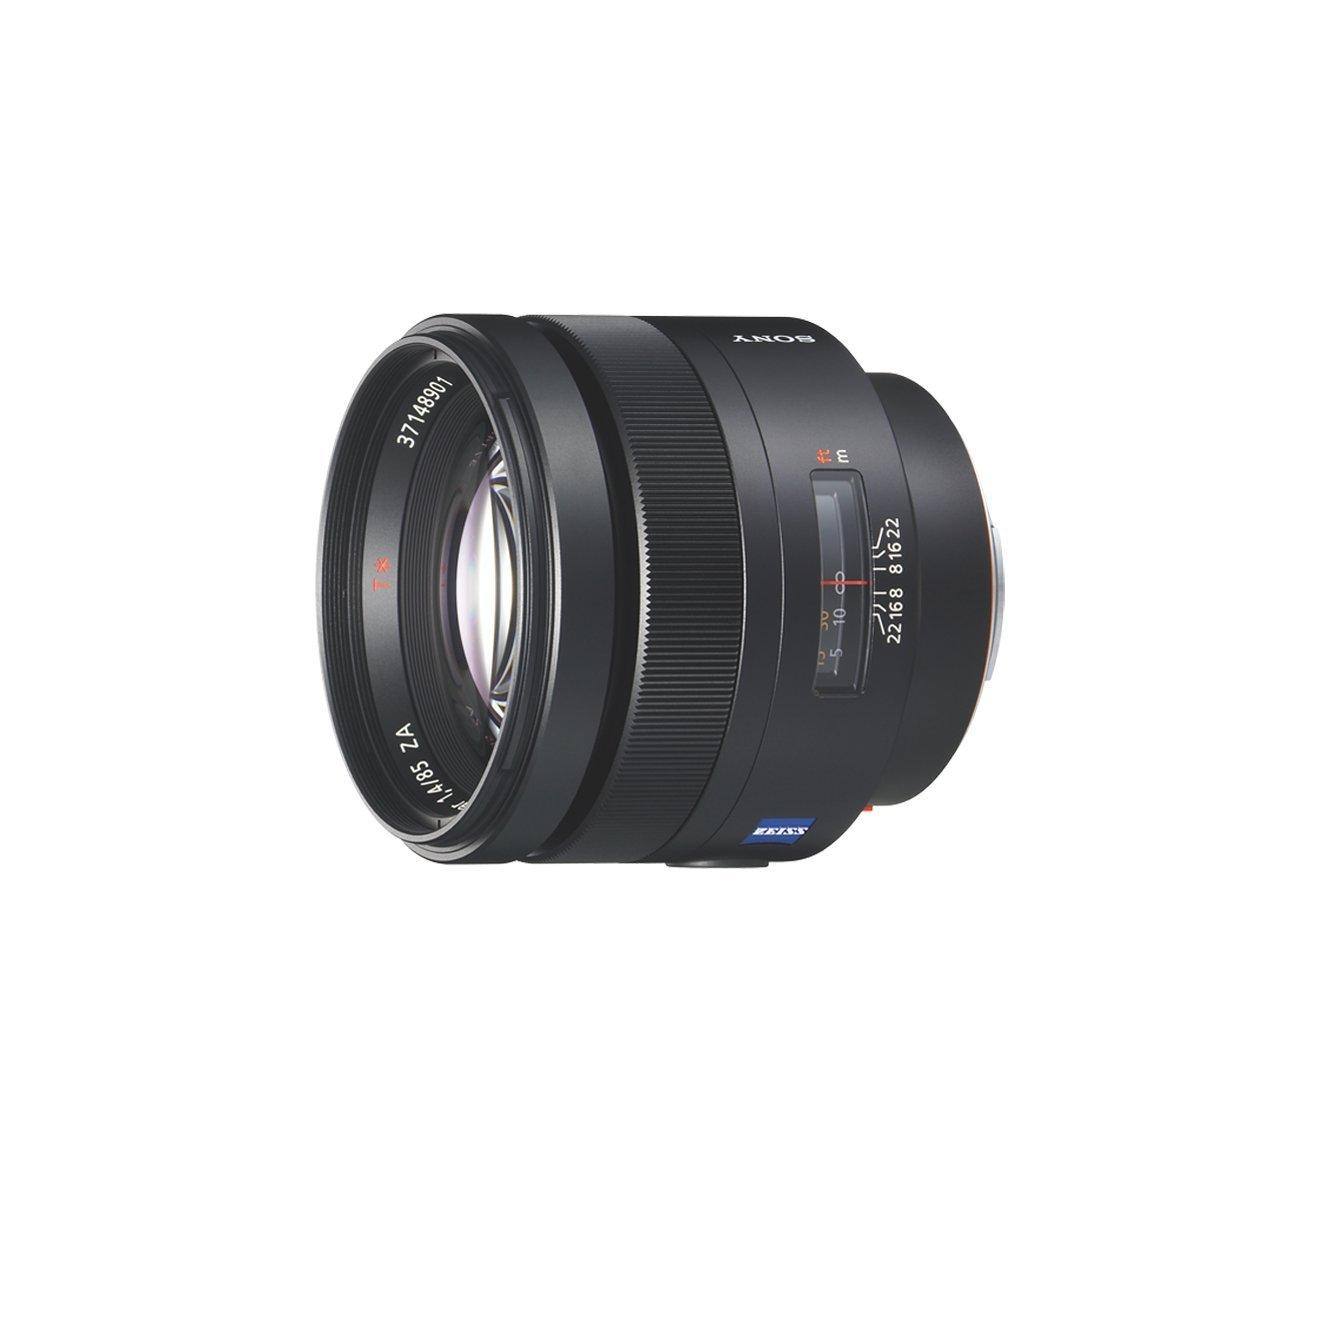 Sony SALFZ Objetivo para Sony Minolta distancia focal fija mm apertura f